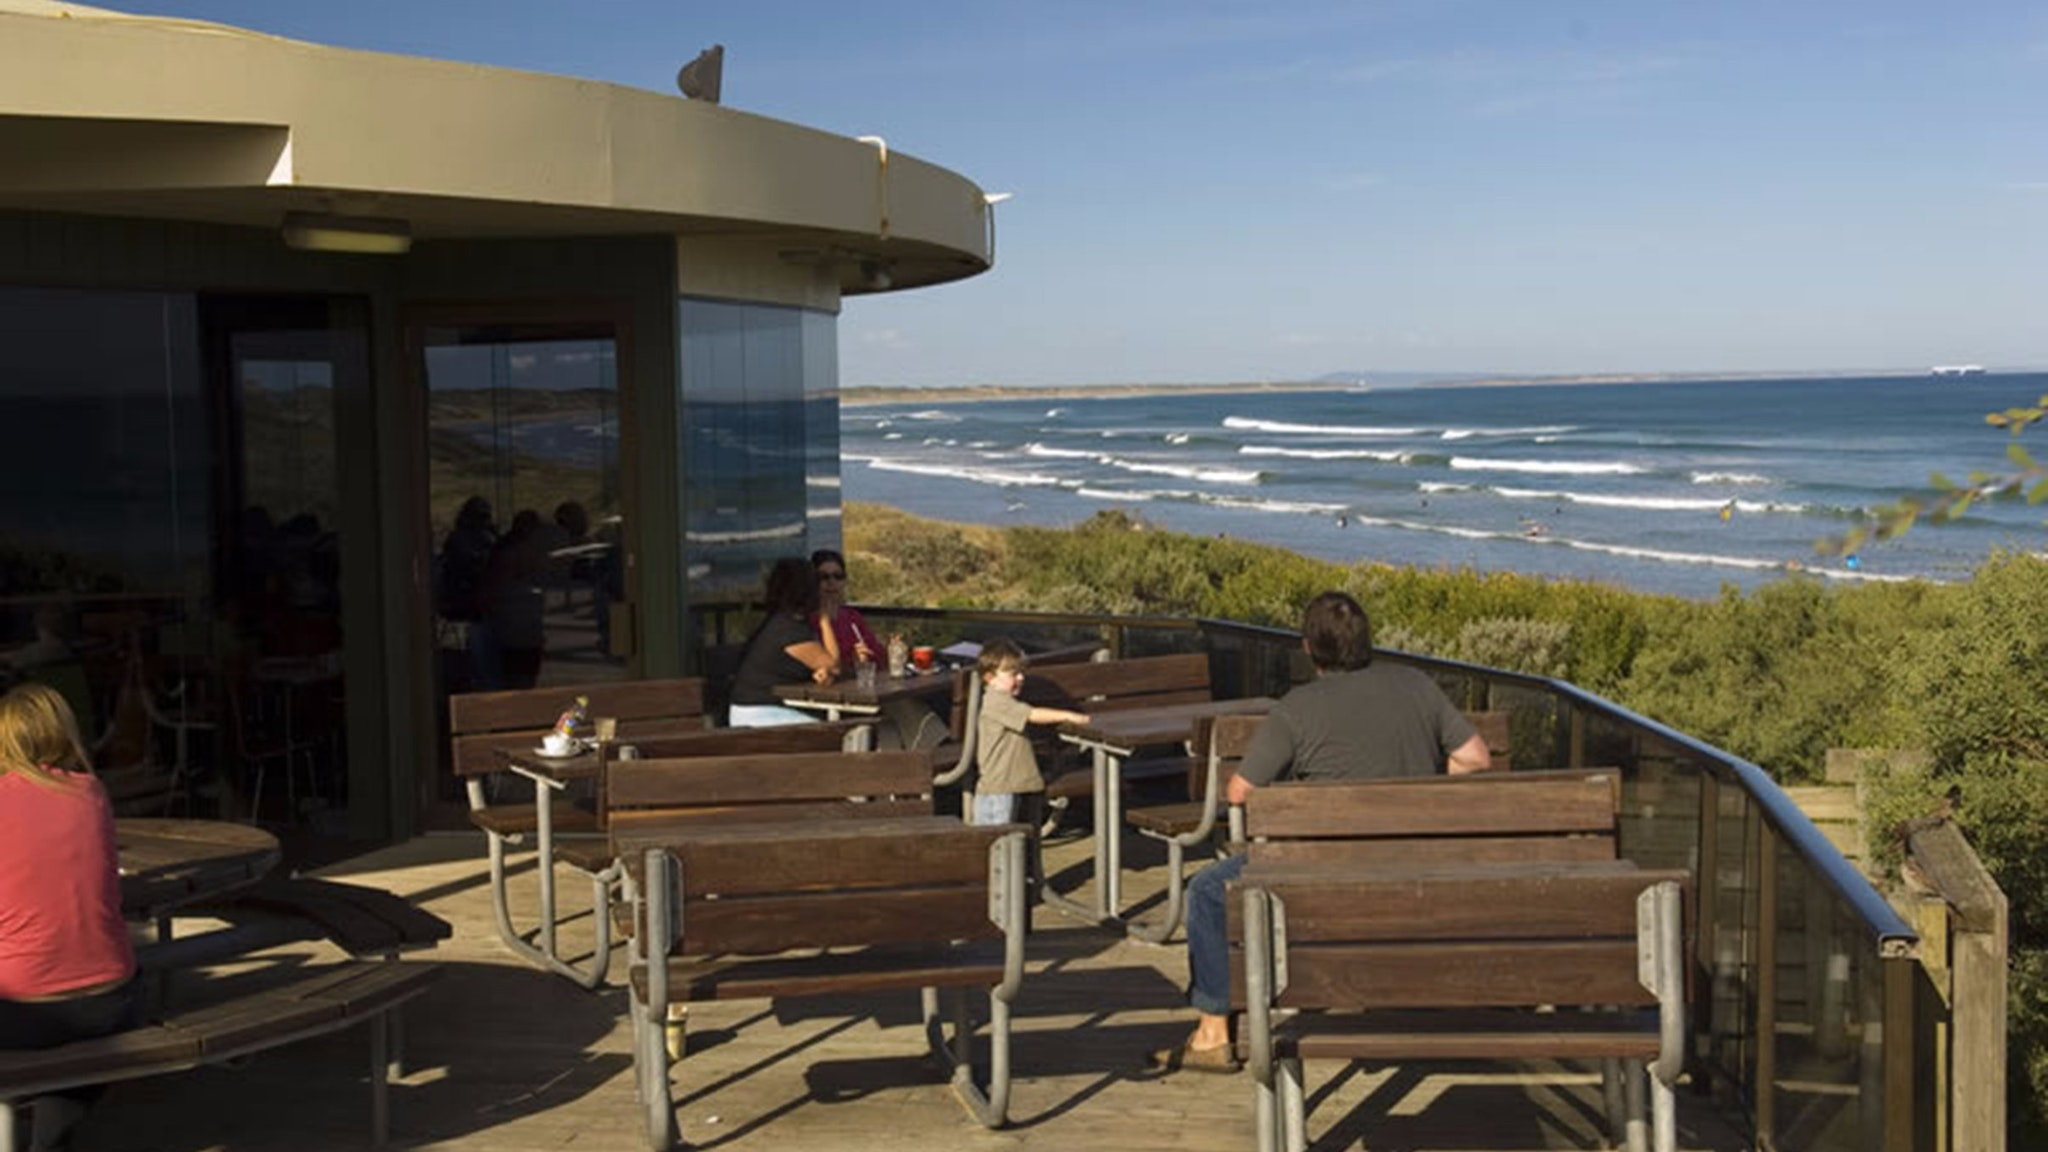 The Dunes Cafe Bar & Restaurant